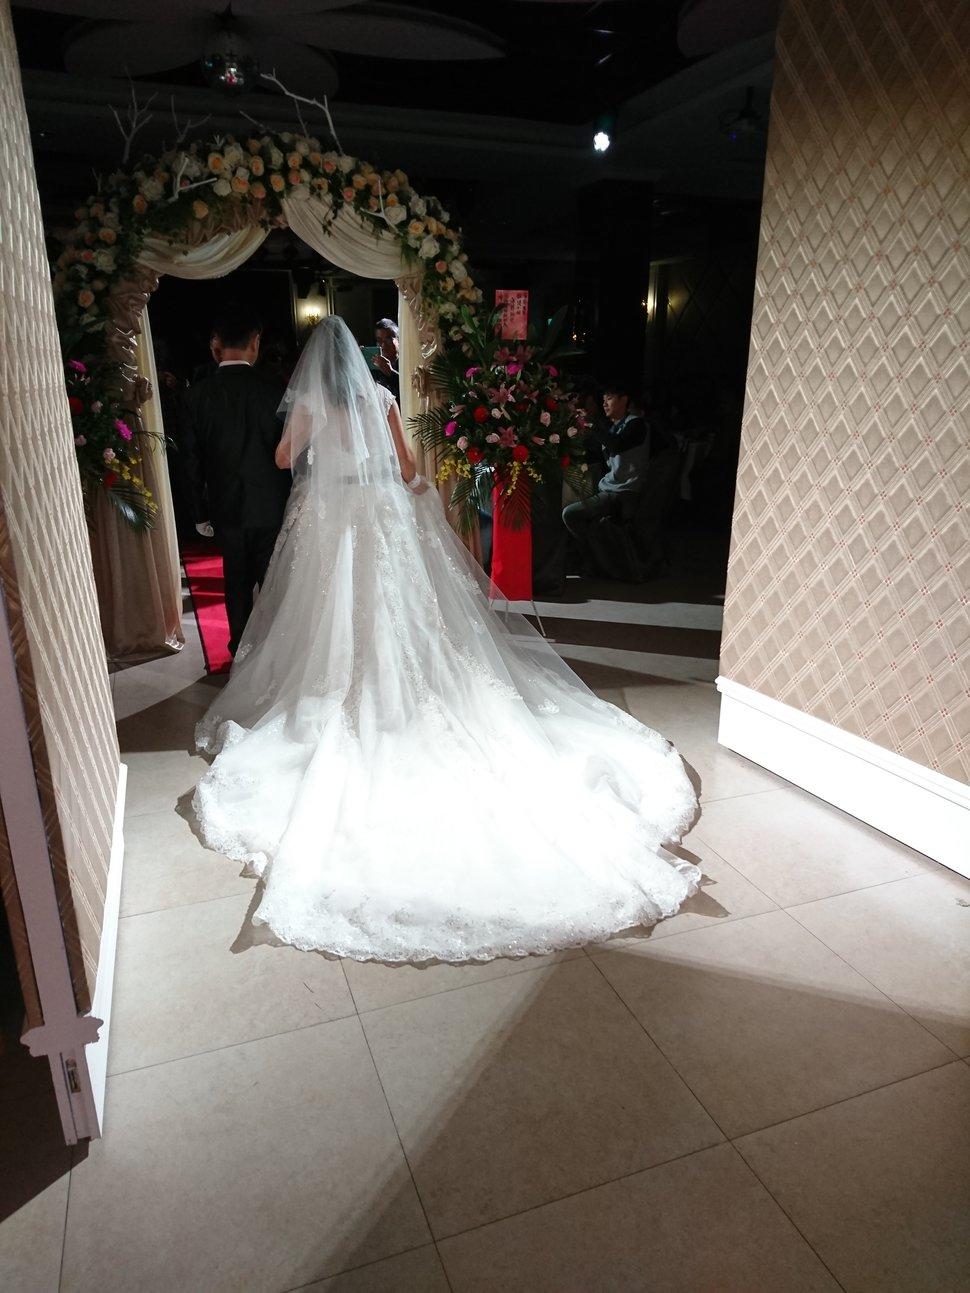 DSC_1826 - 陳靖  新娘秘書 - 結婚吧